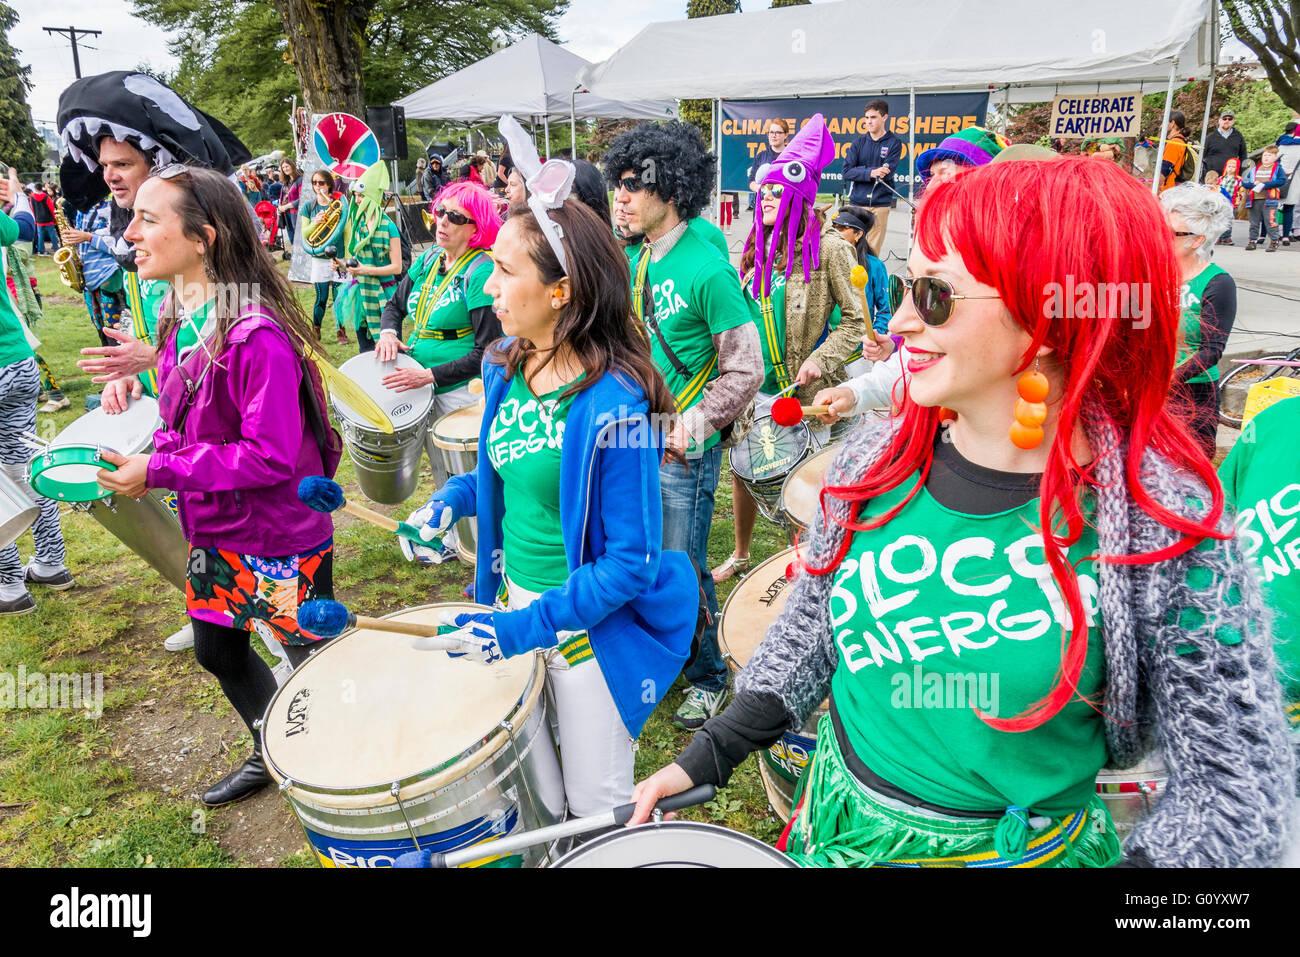 Tambour de Bloco Energia effectuer le jour de la Terre au rallye, Vancouver, British Columbia, Canada Photo Stock